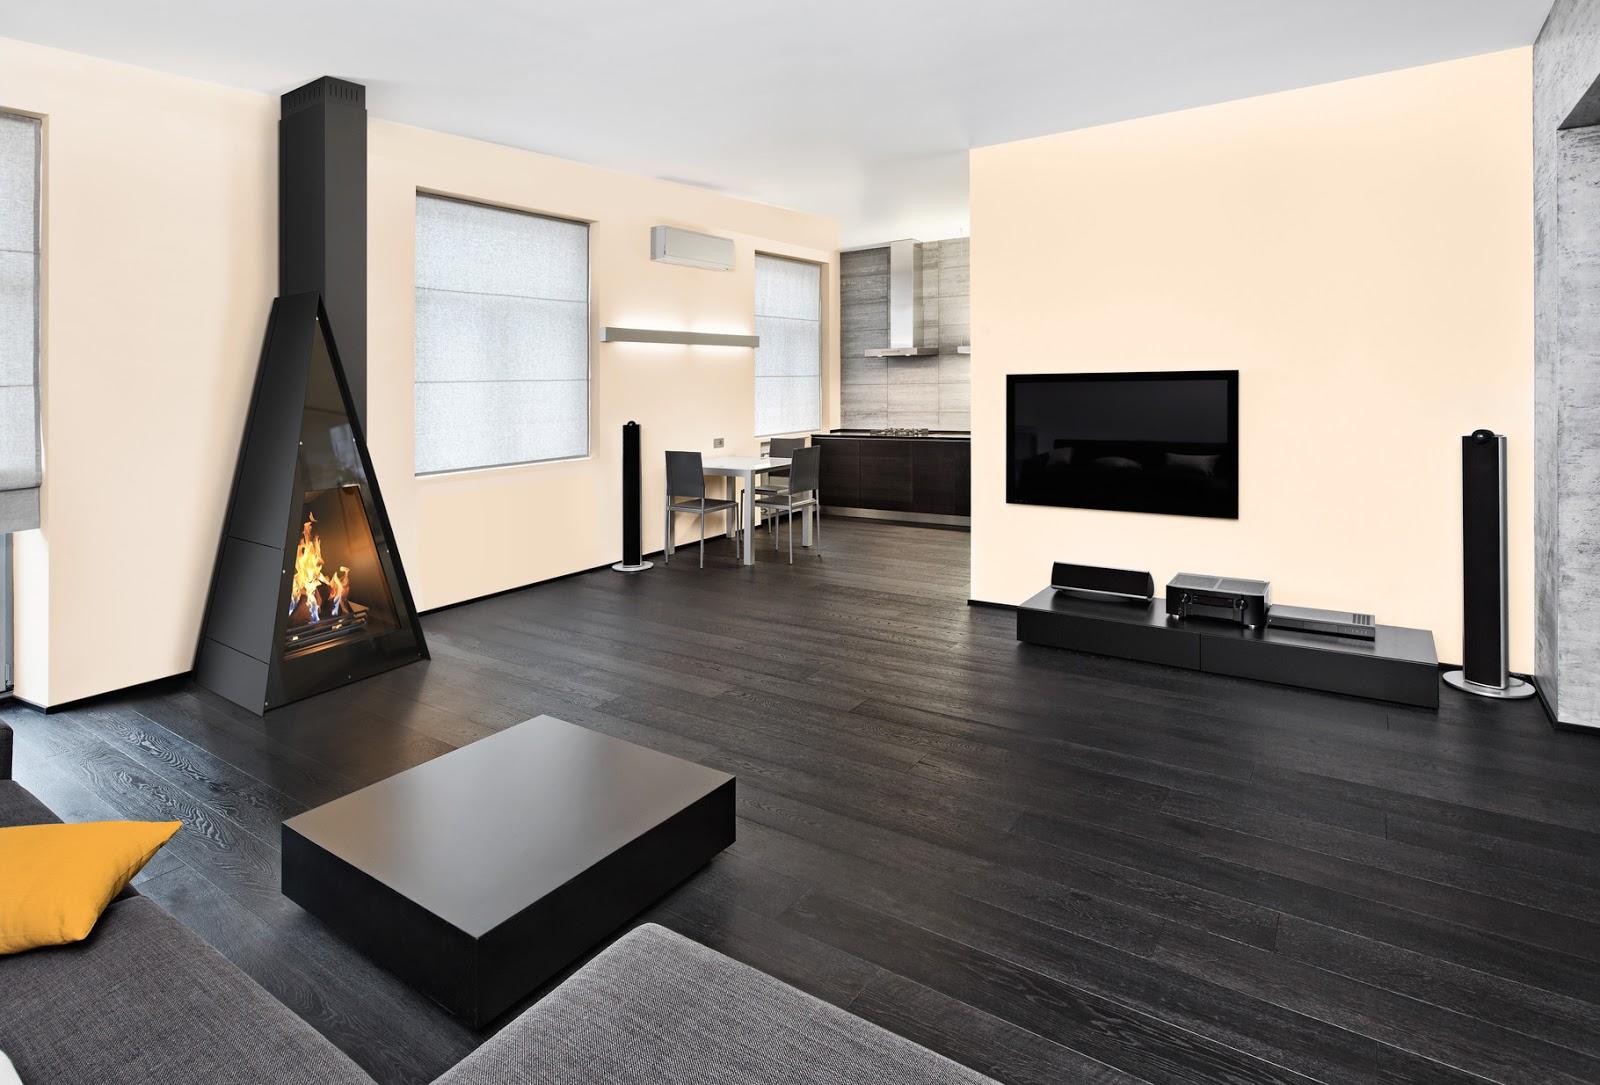 Casas modulares y prefabricadas de dise o chimeneas de - Chimeneas de esquina modernas ...